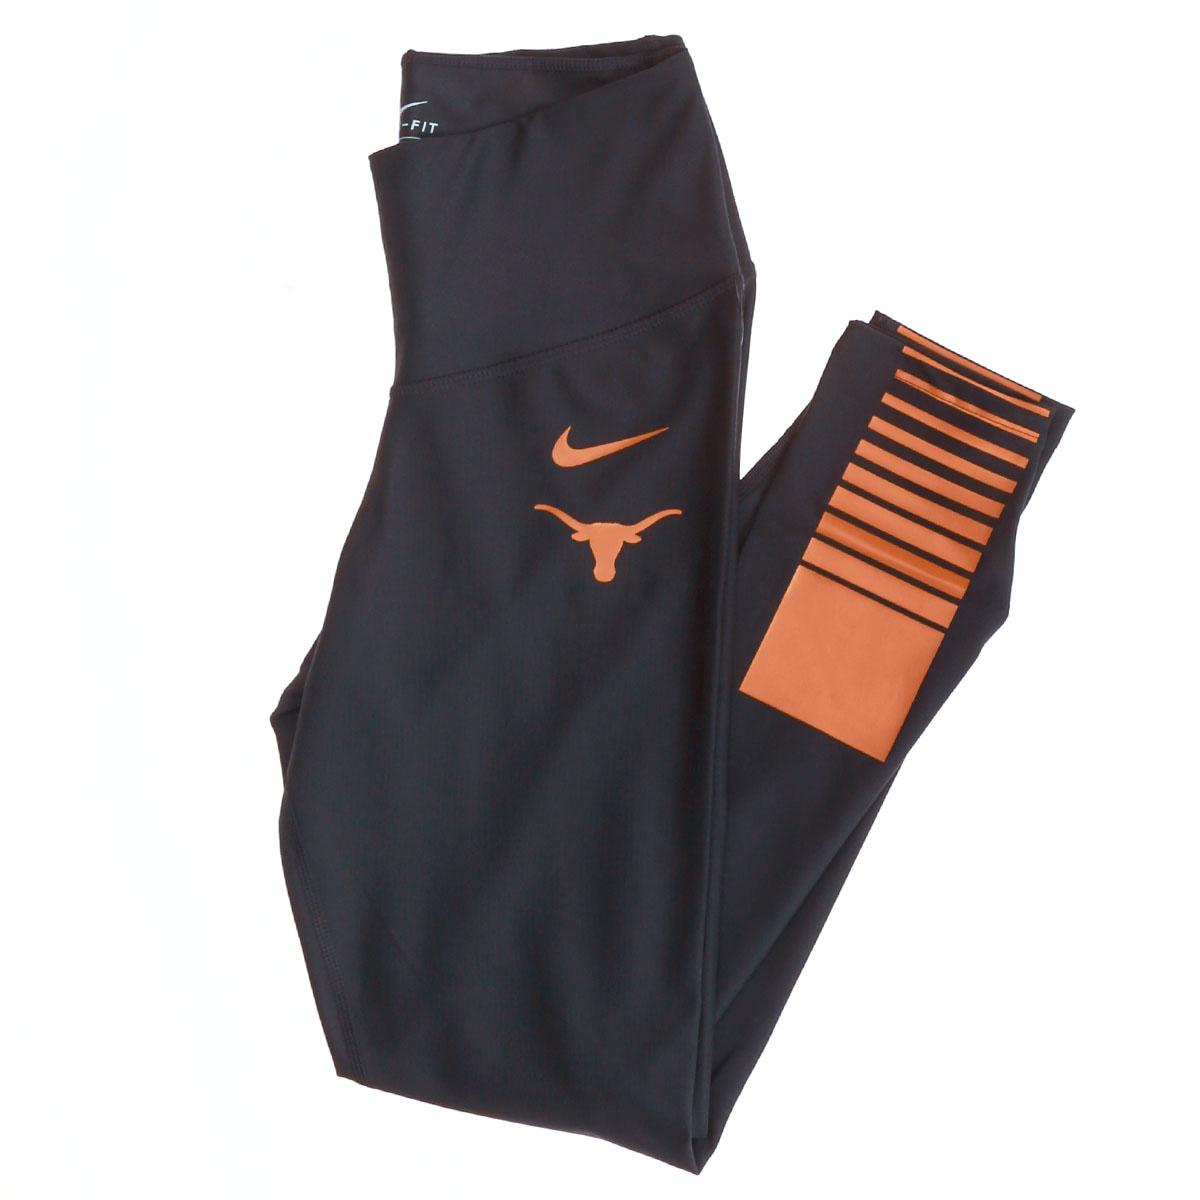 Ladies Dri Texas Nike Victory Sculpt Leggings Longhorns Fit kiuPXZ